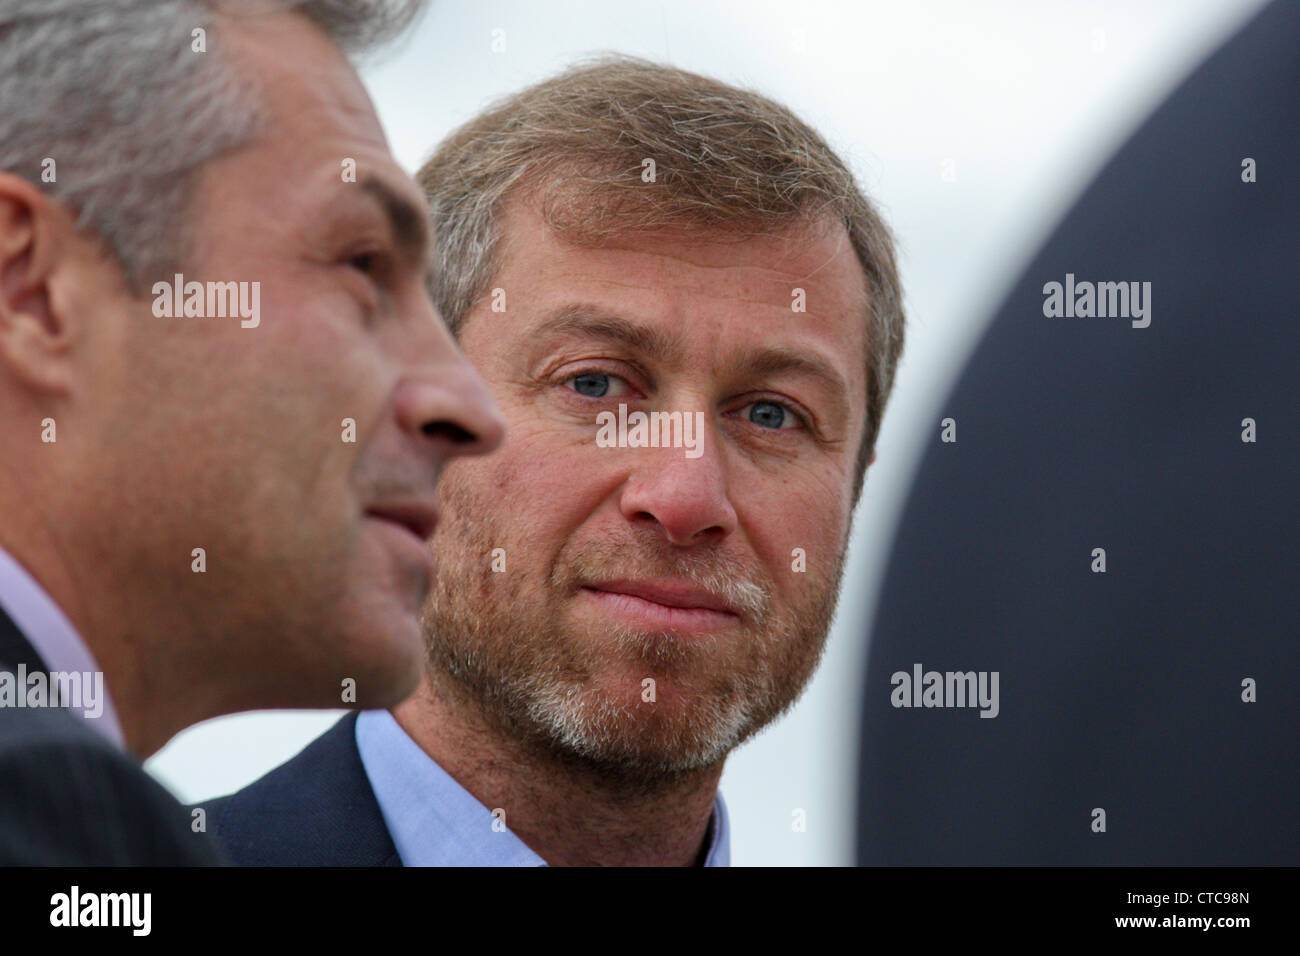 Russian billionaire Roman Abramovich during a ceremony at Skolkovo MBA school near Moscow, Russia - Stock Image